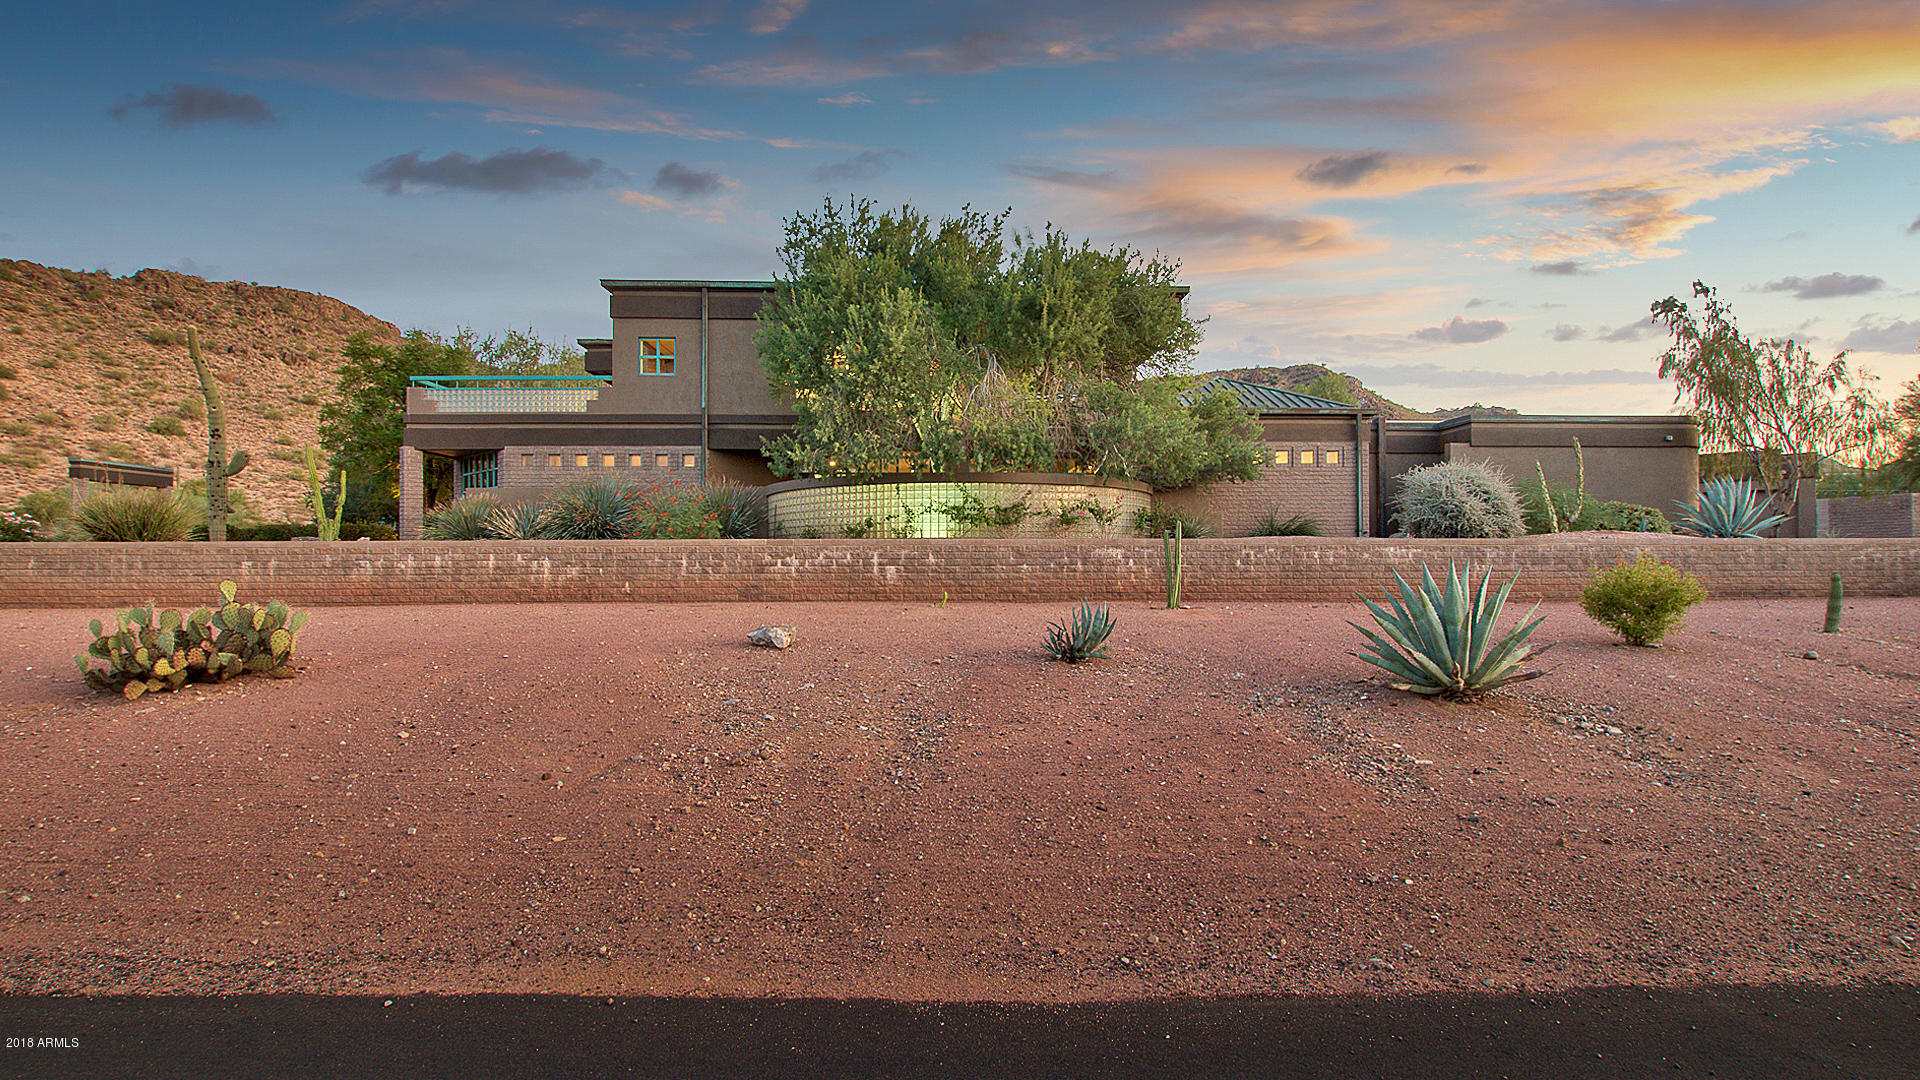 MLS 5845807 4337 E FANFOL Drive, Phoenix, AZ 85028 Phoenix AZ Short Sale